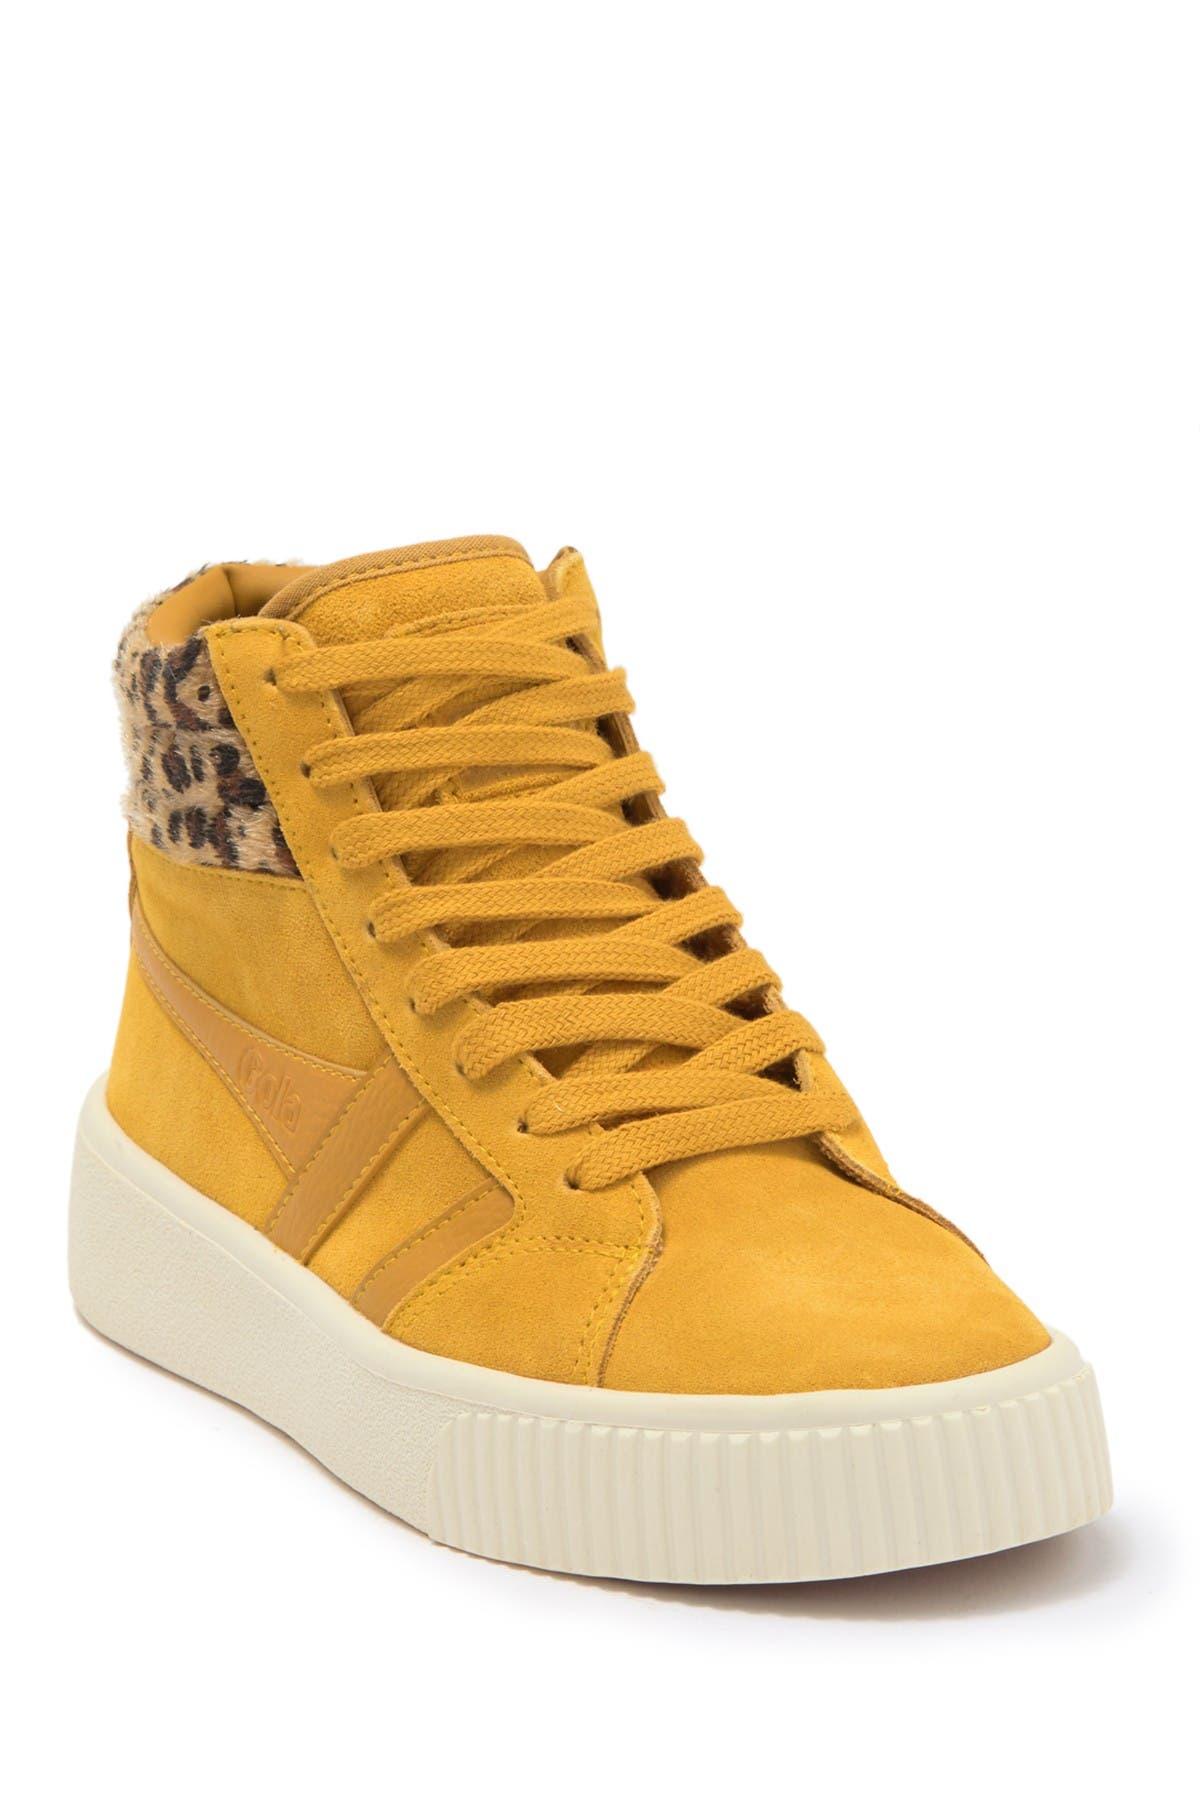 Image of Gola Baseline Savanna Sneaker